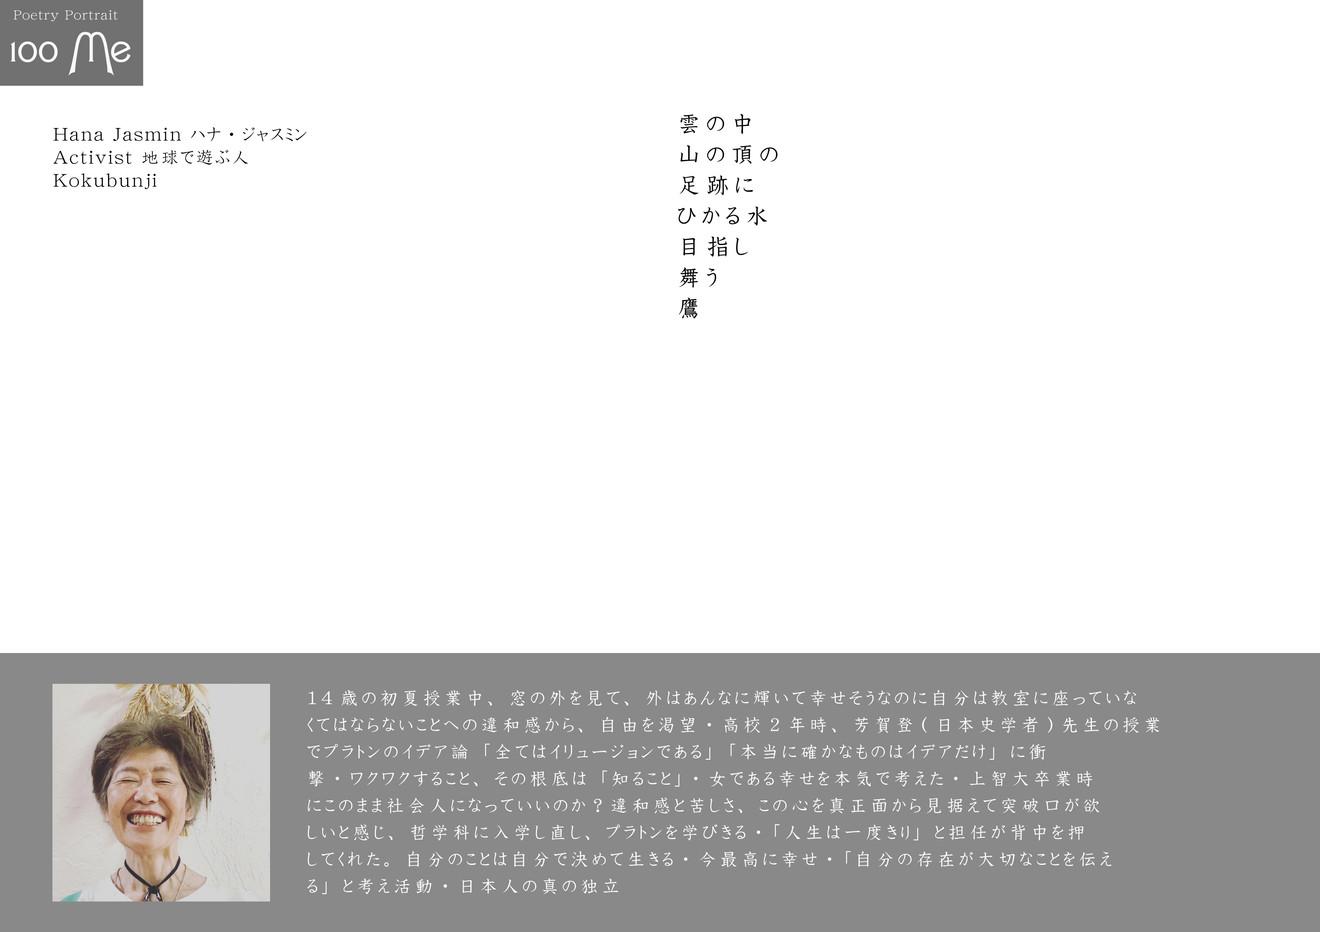 43-Hana Jasmin.jpg